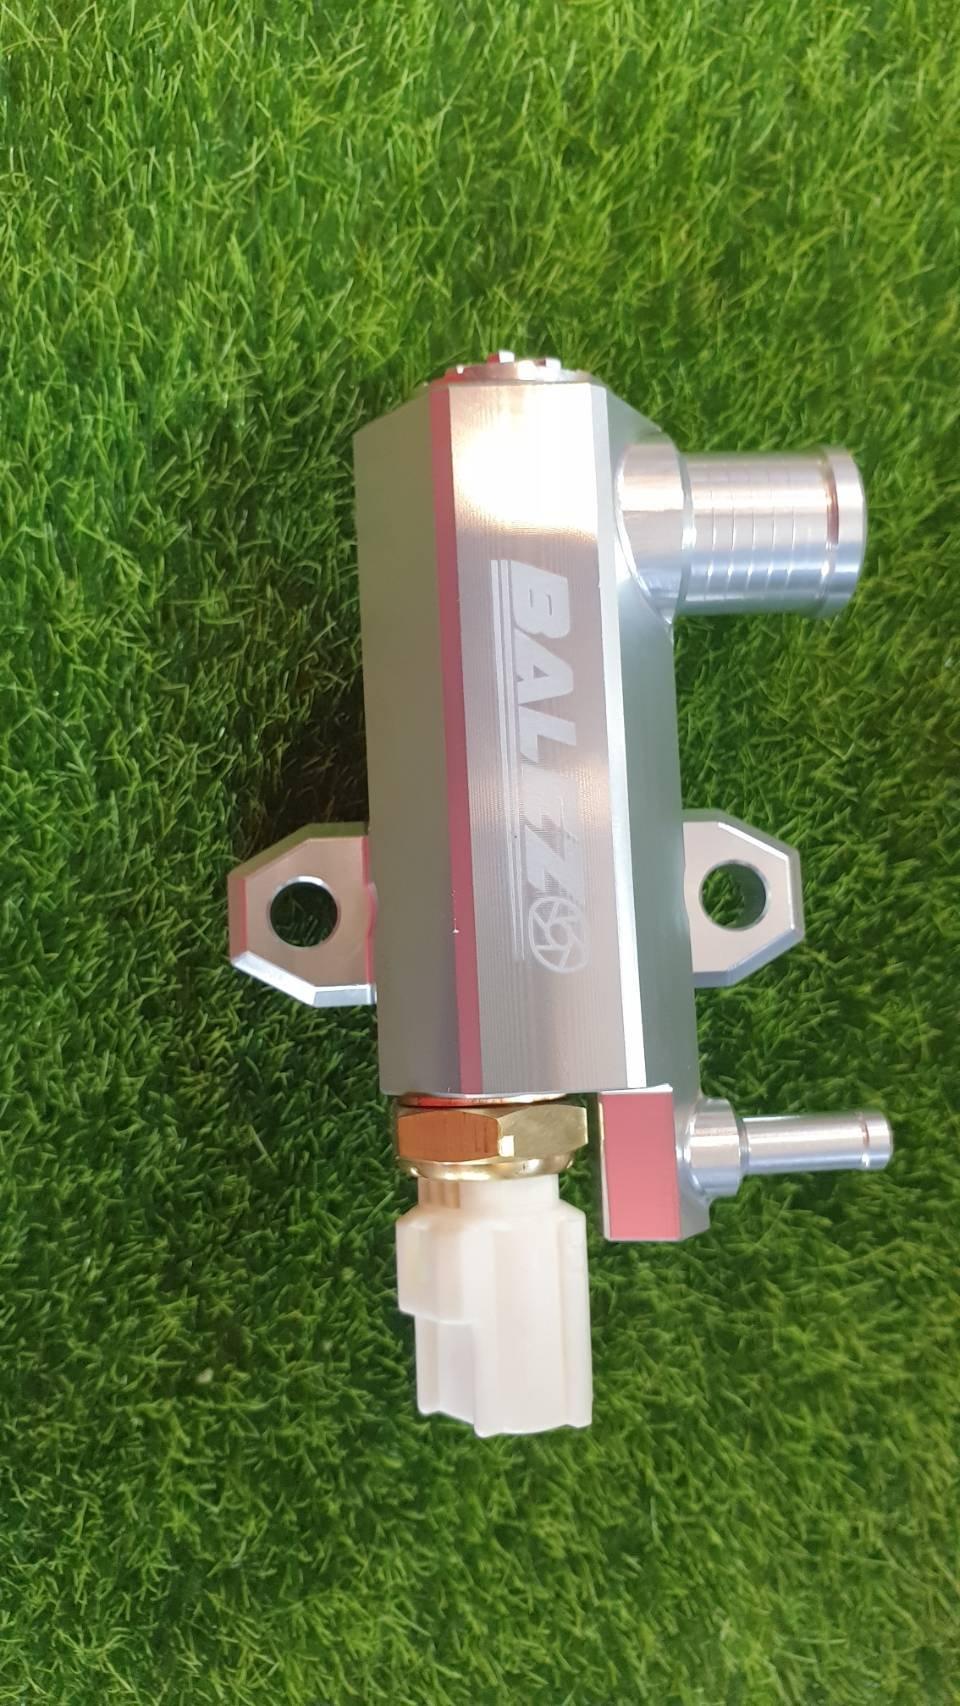 BALEZO Force Smax 快速流動 節溫器 解決水龜故障 直上 免修改 force smax 價格3000